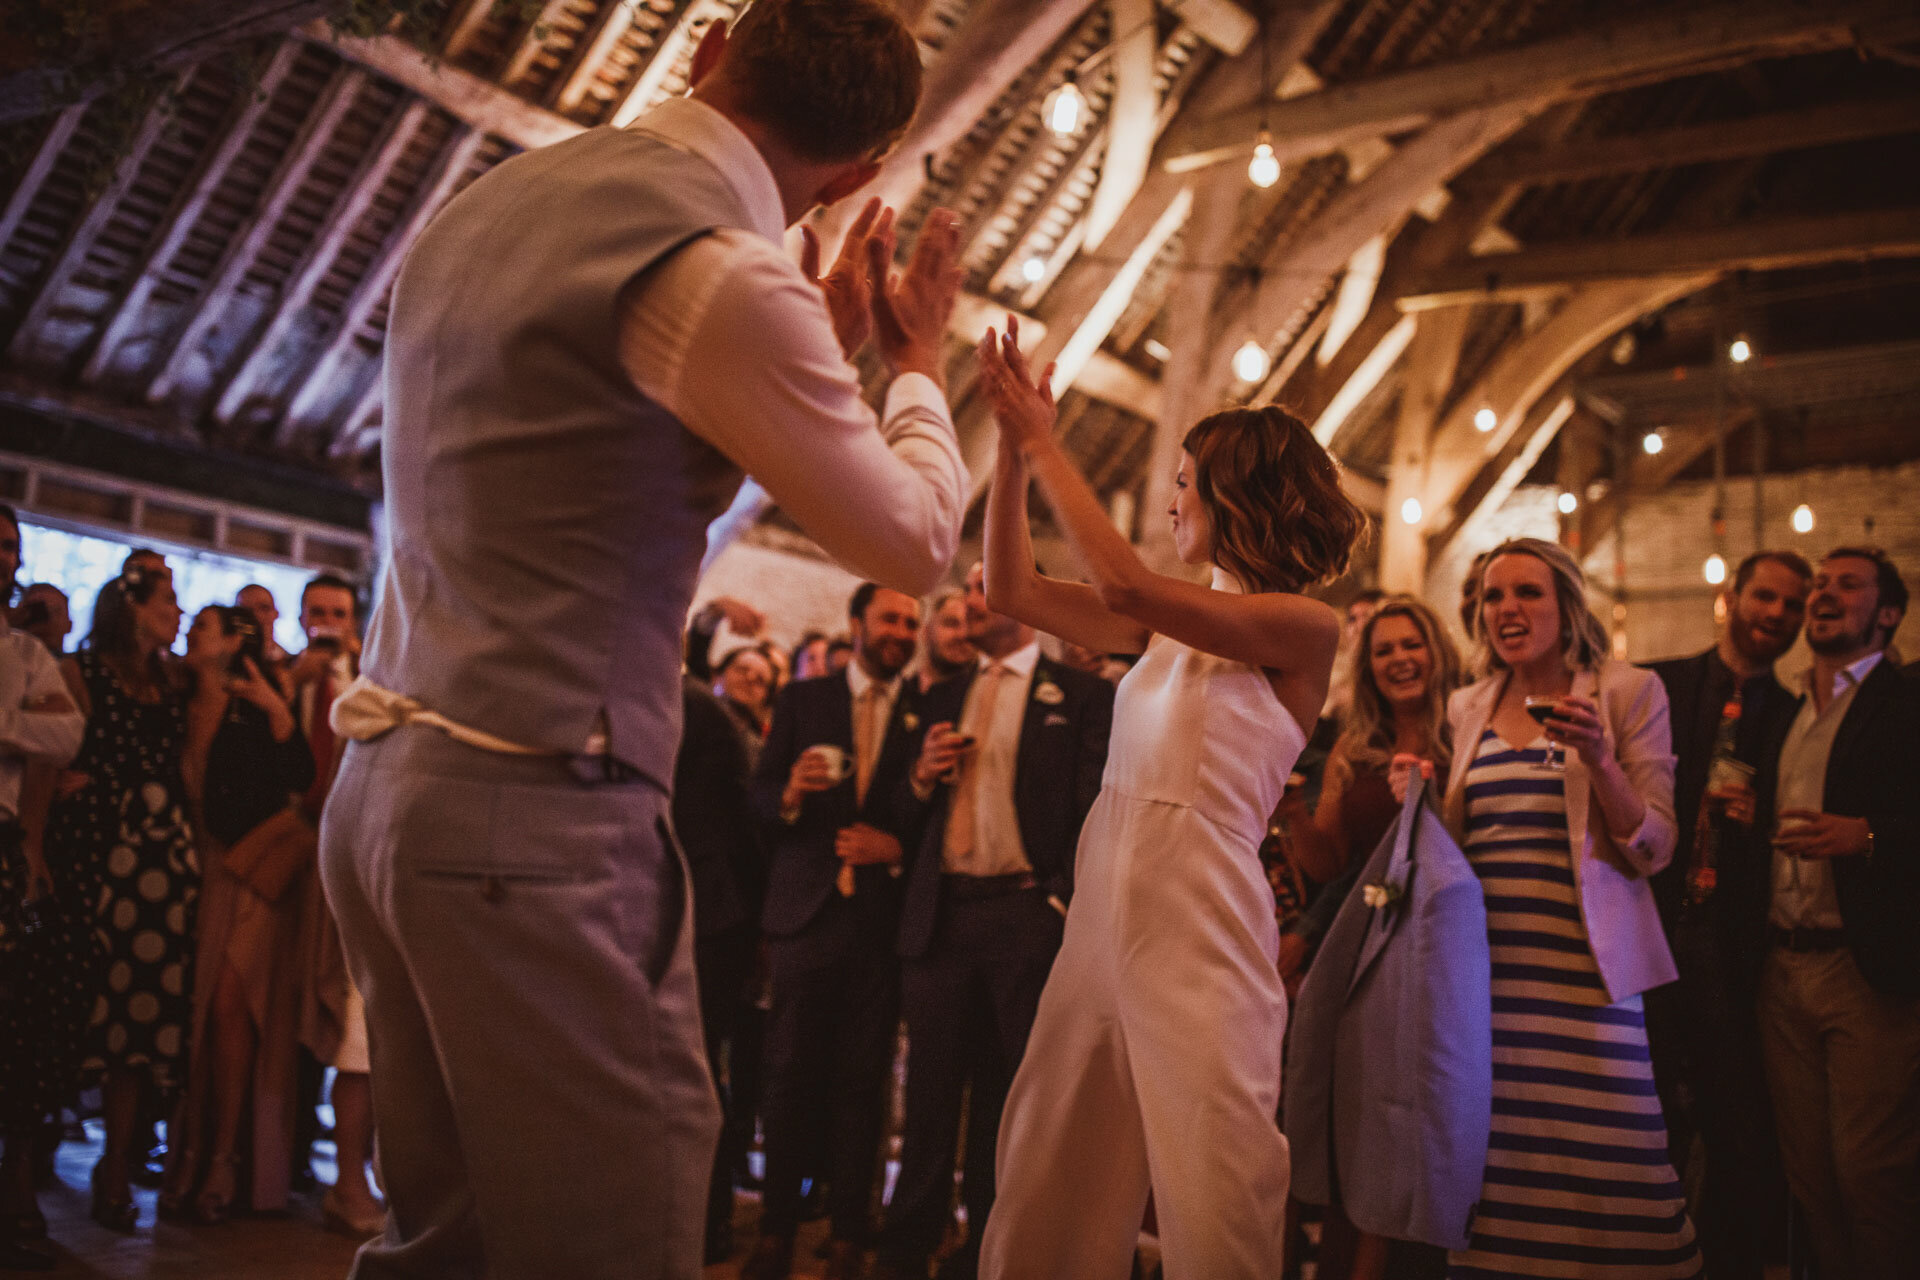 dorset_wedding_photographer-141.jpg